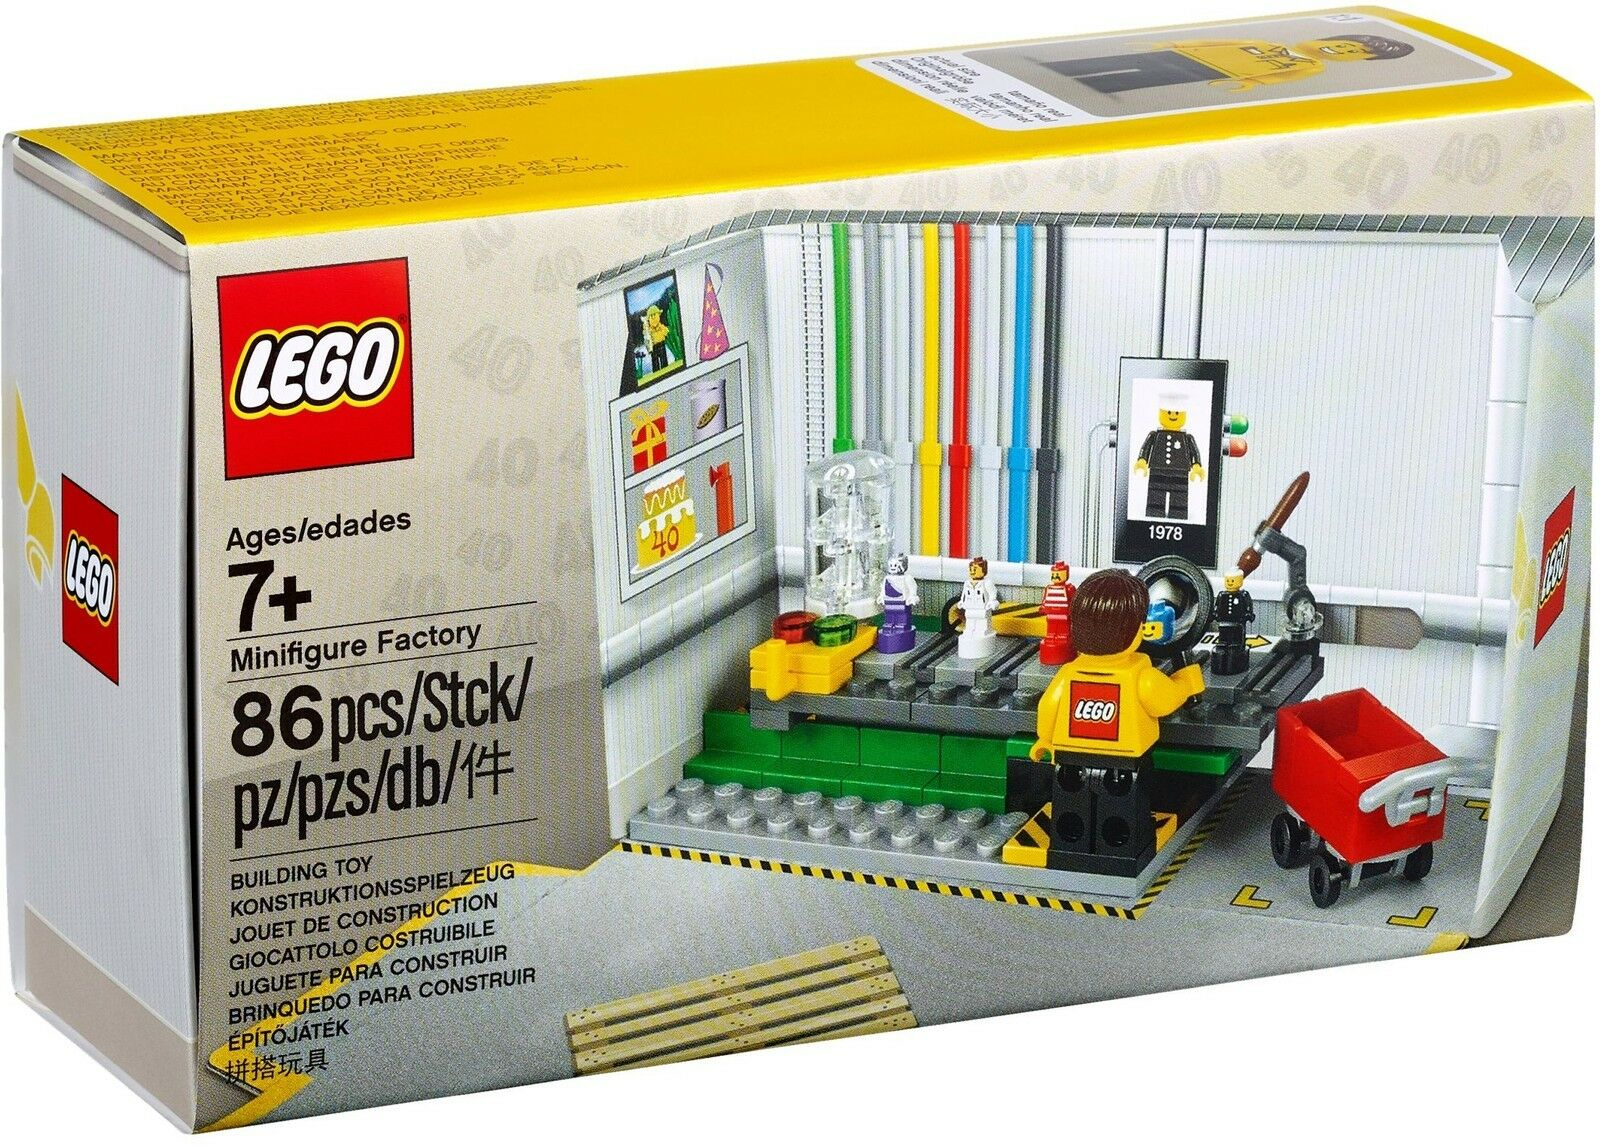 LEGO® Classic 5005358 Minifigurenfabrik NEU OVP_Minifigure Factory NEW MISB NRFB